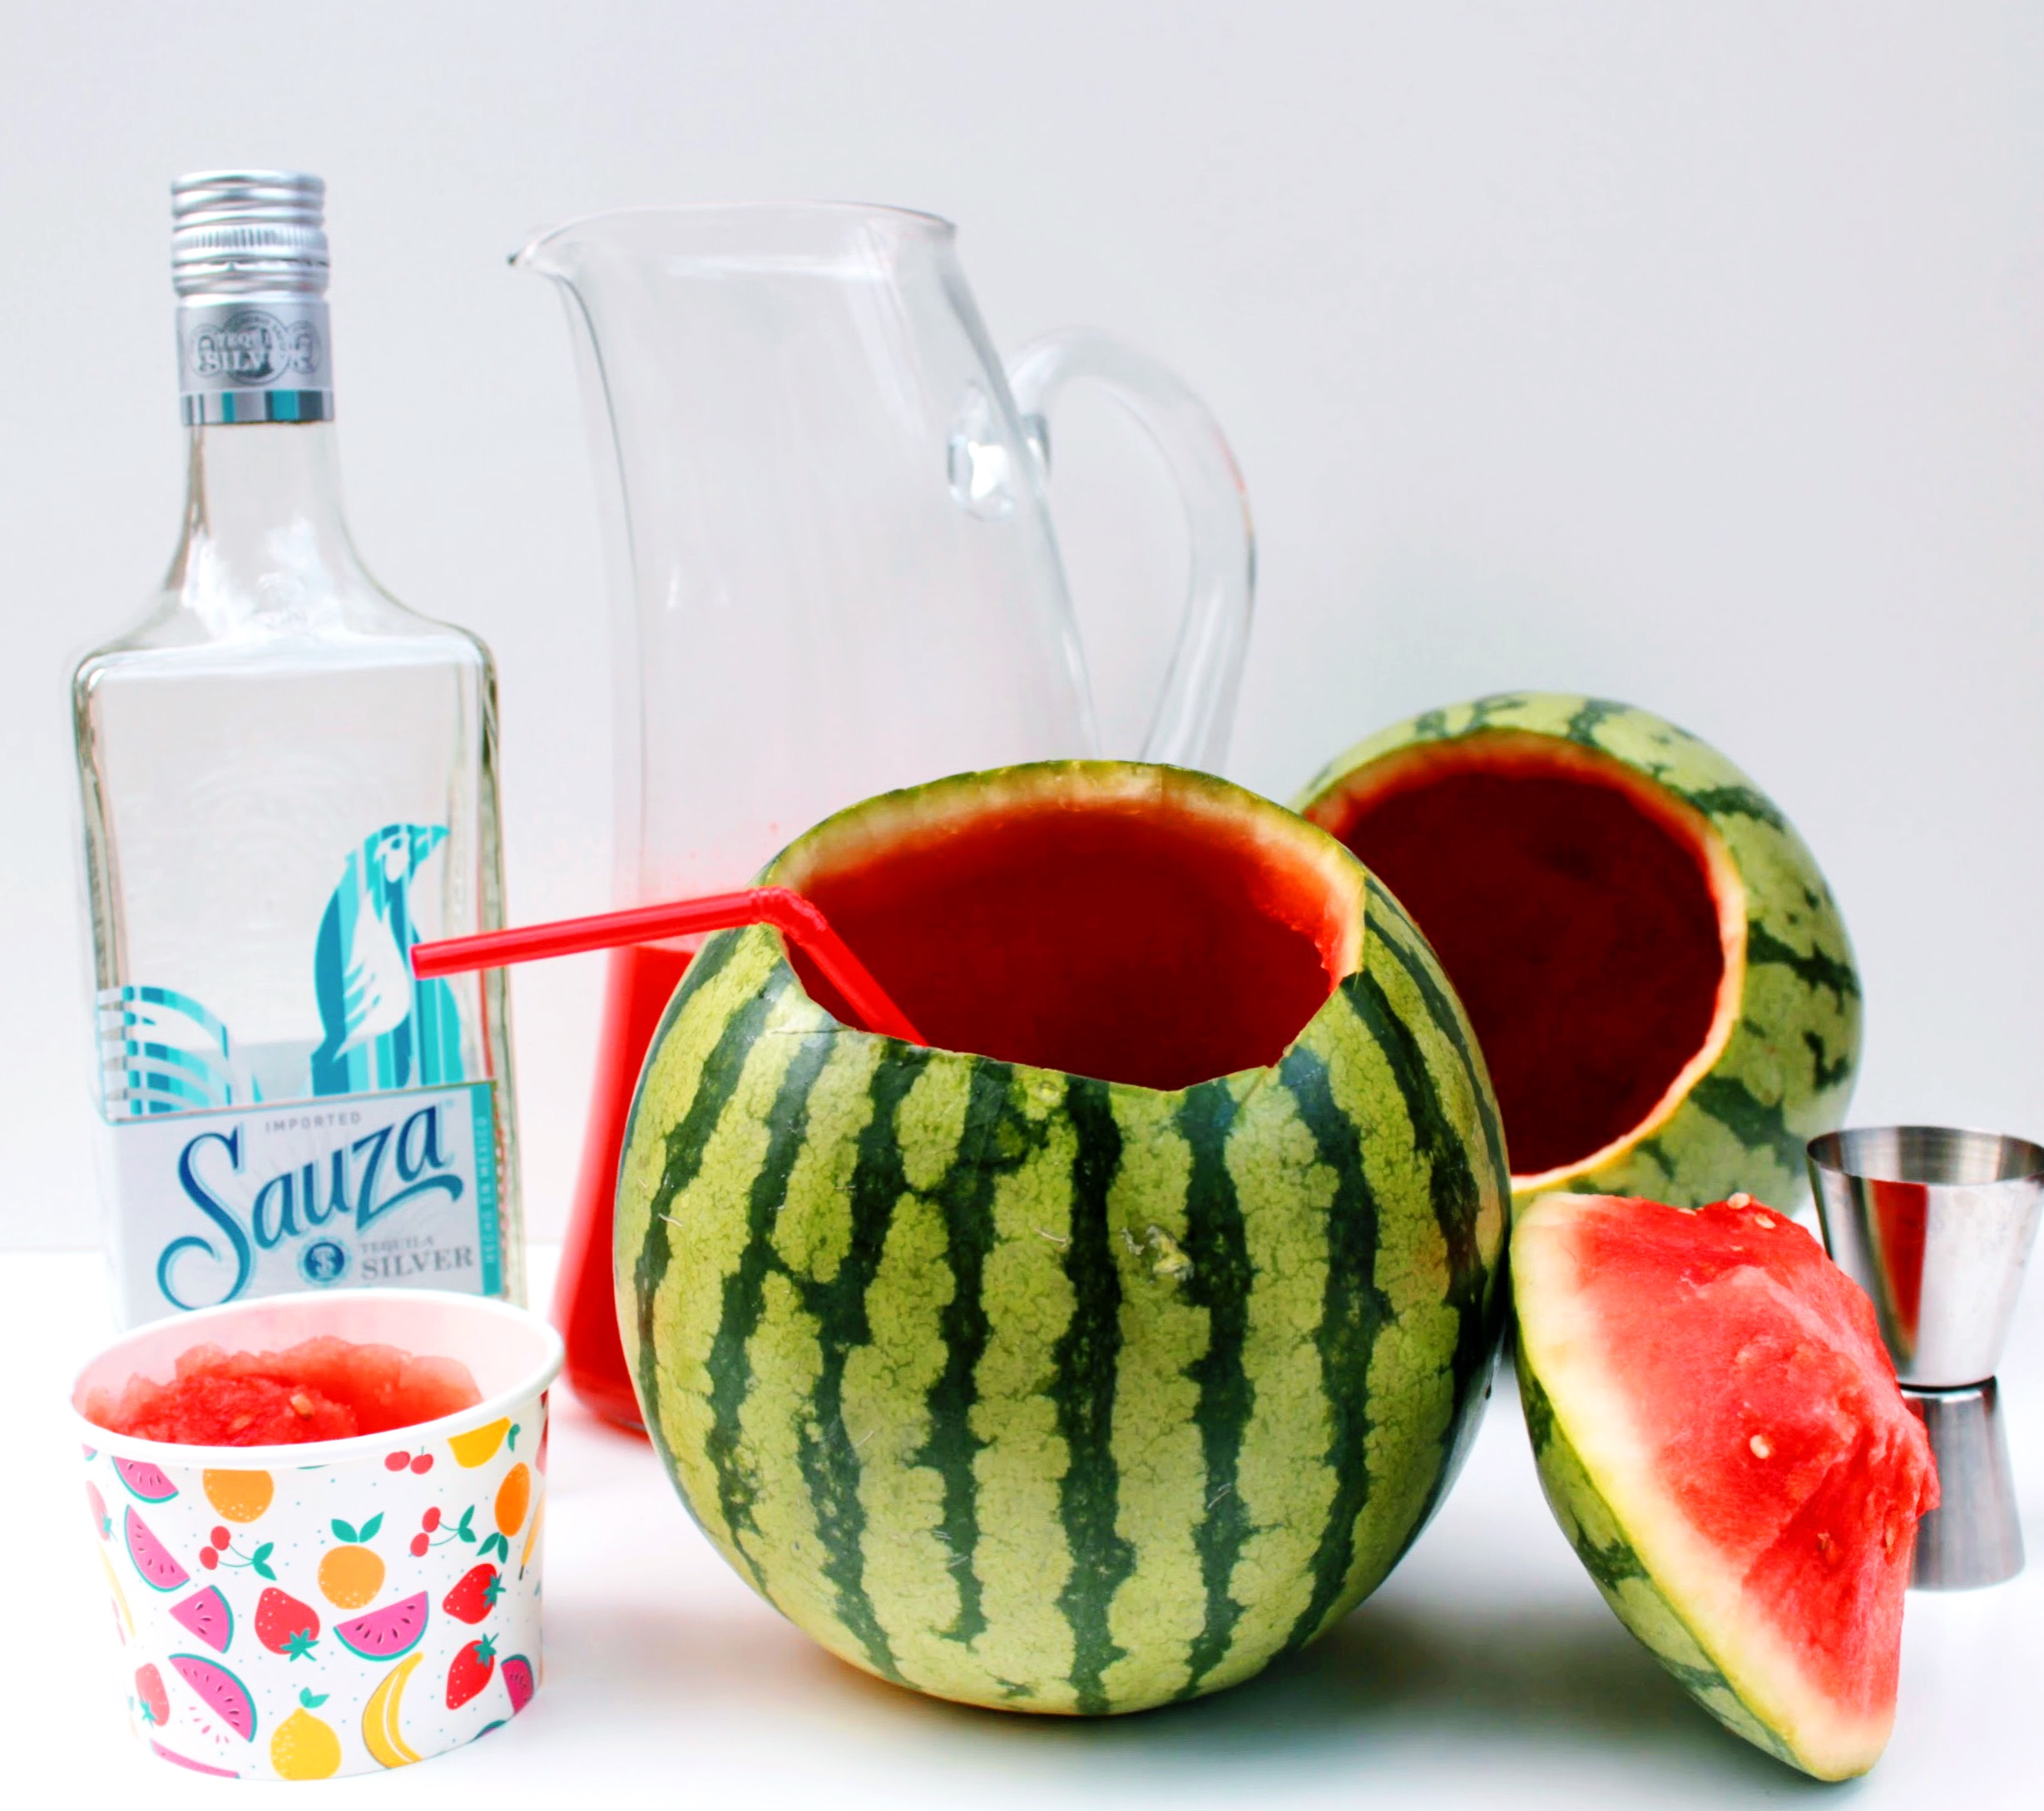 Mini Watermelon Cocktail with Sauza Silver Tequila.